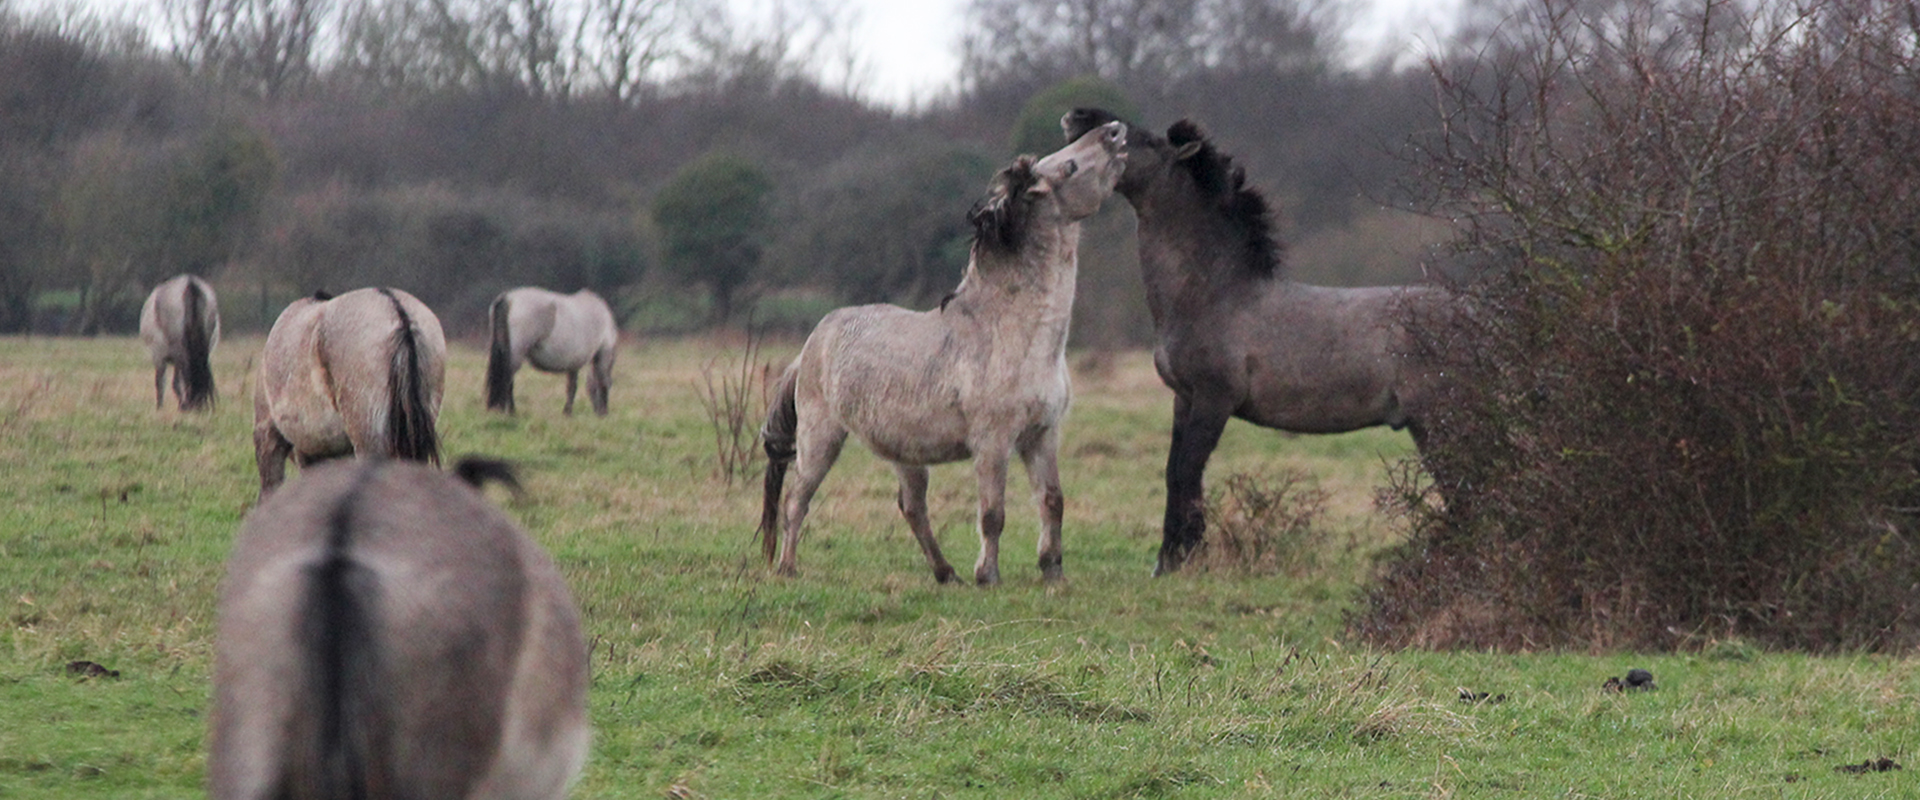 horses interacting